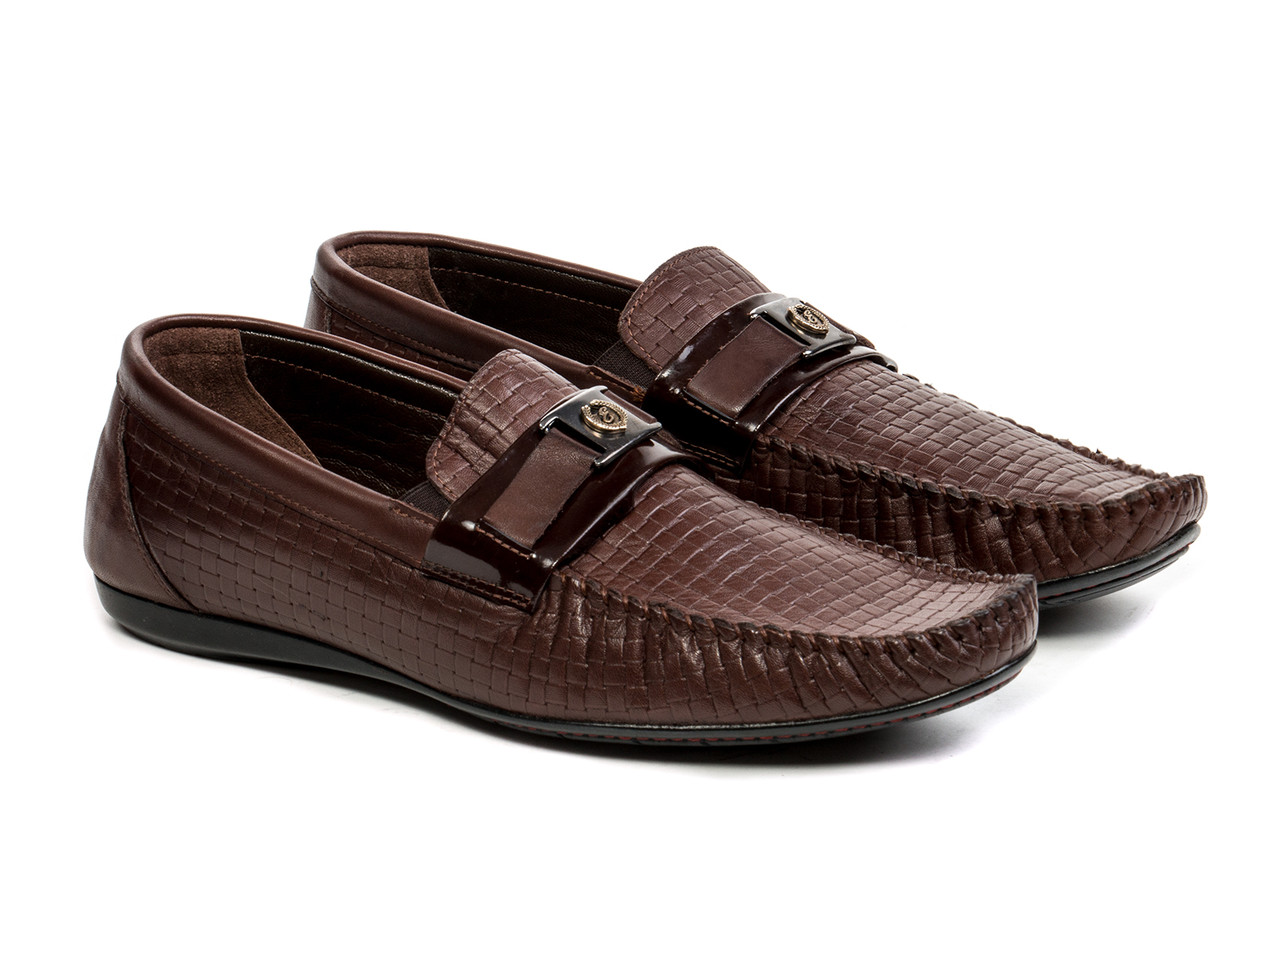 Мокасины Etor 13252-11601-52-199 43 коричневые